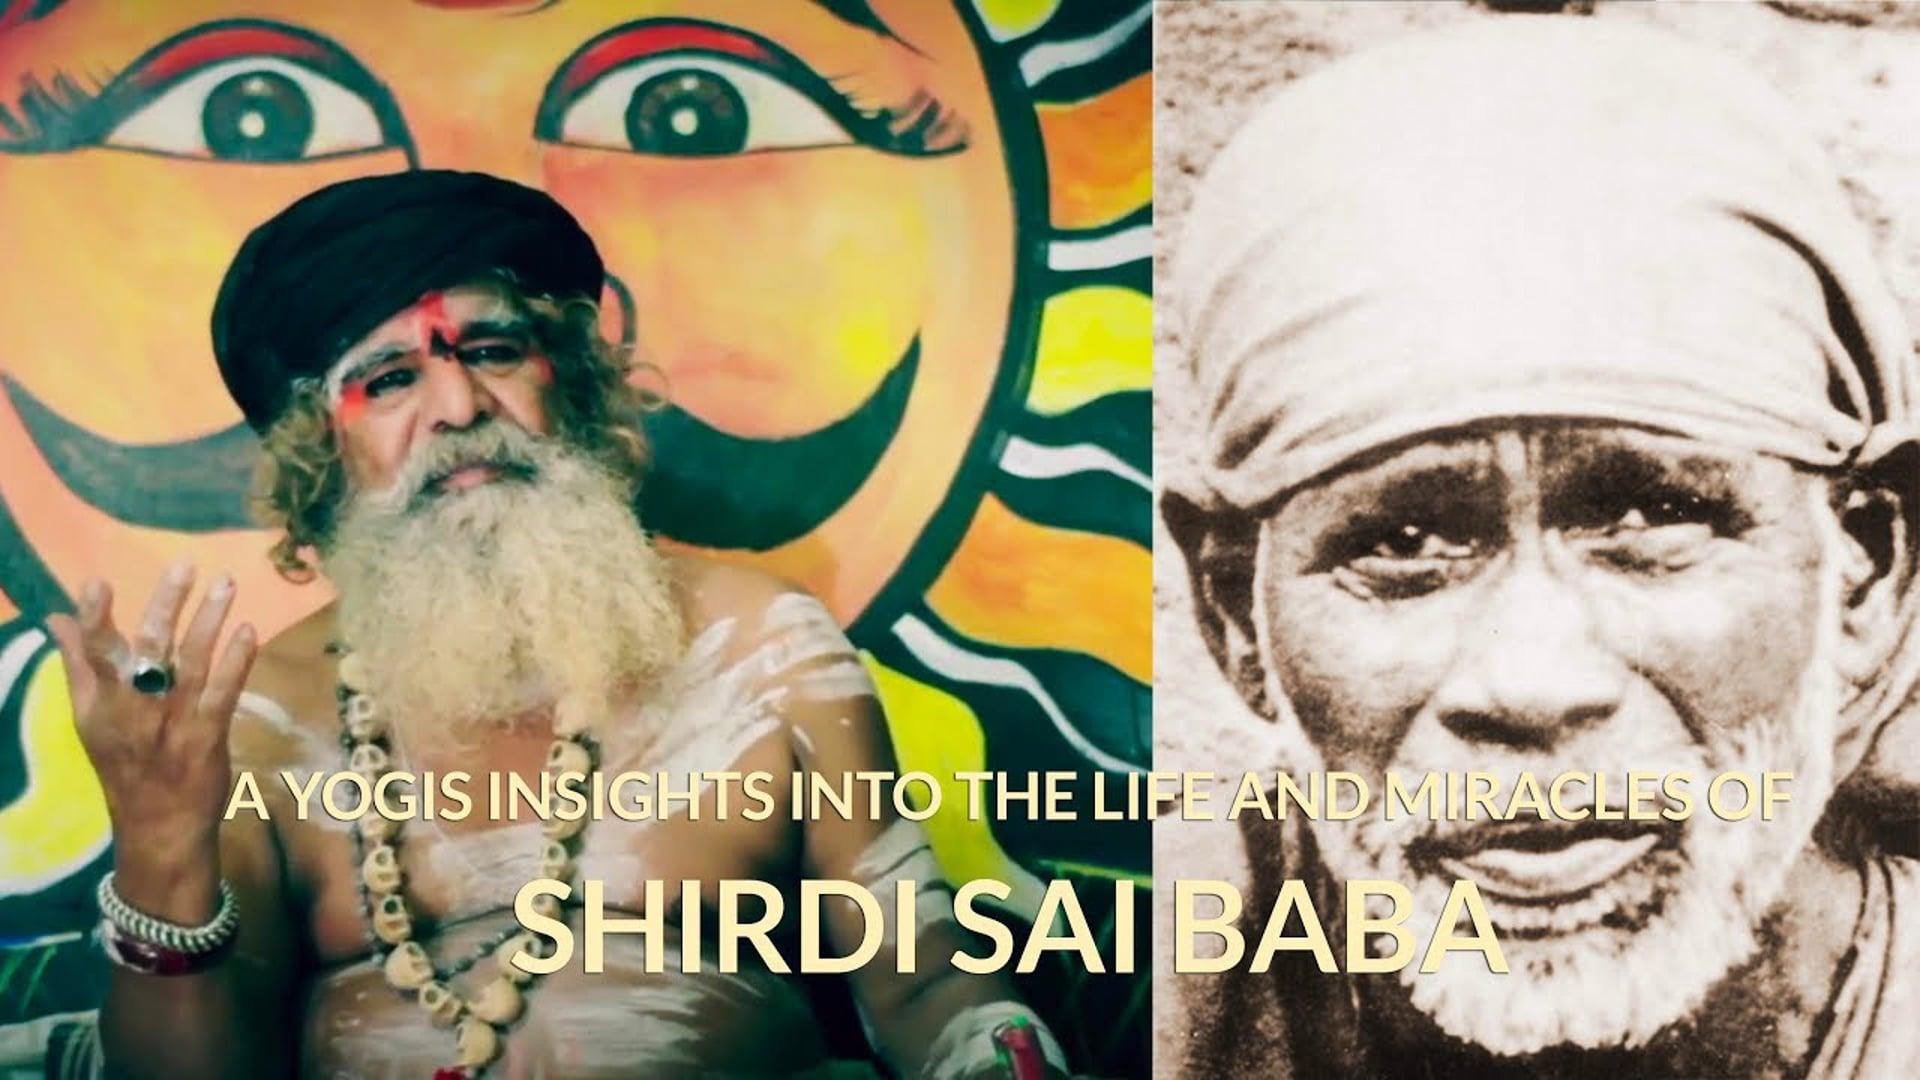 A Yogi's Insights into the Life of Sai Baba